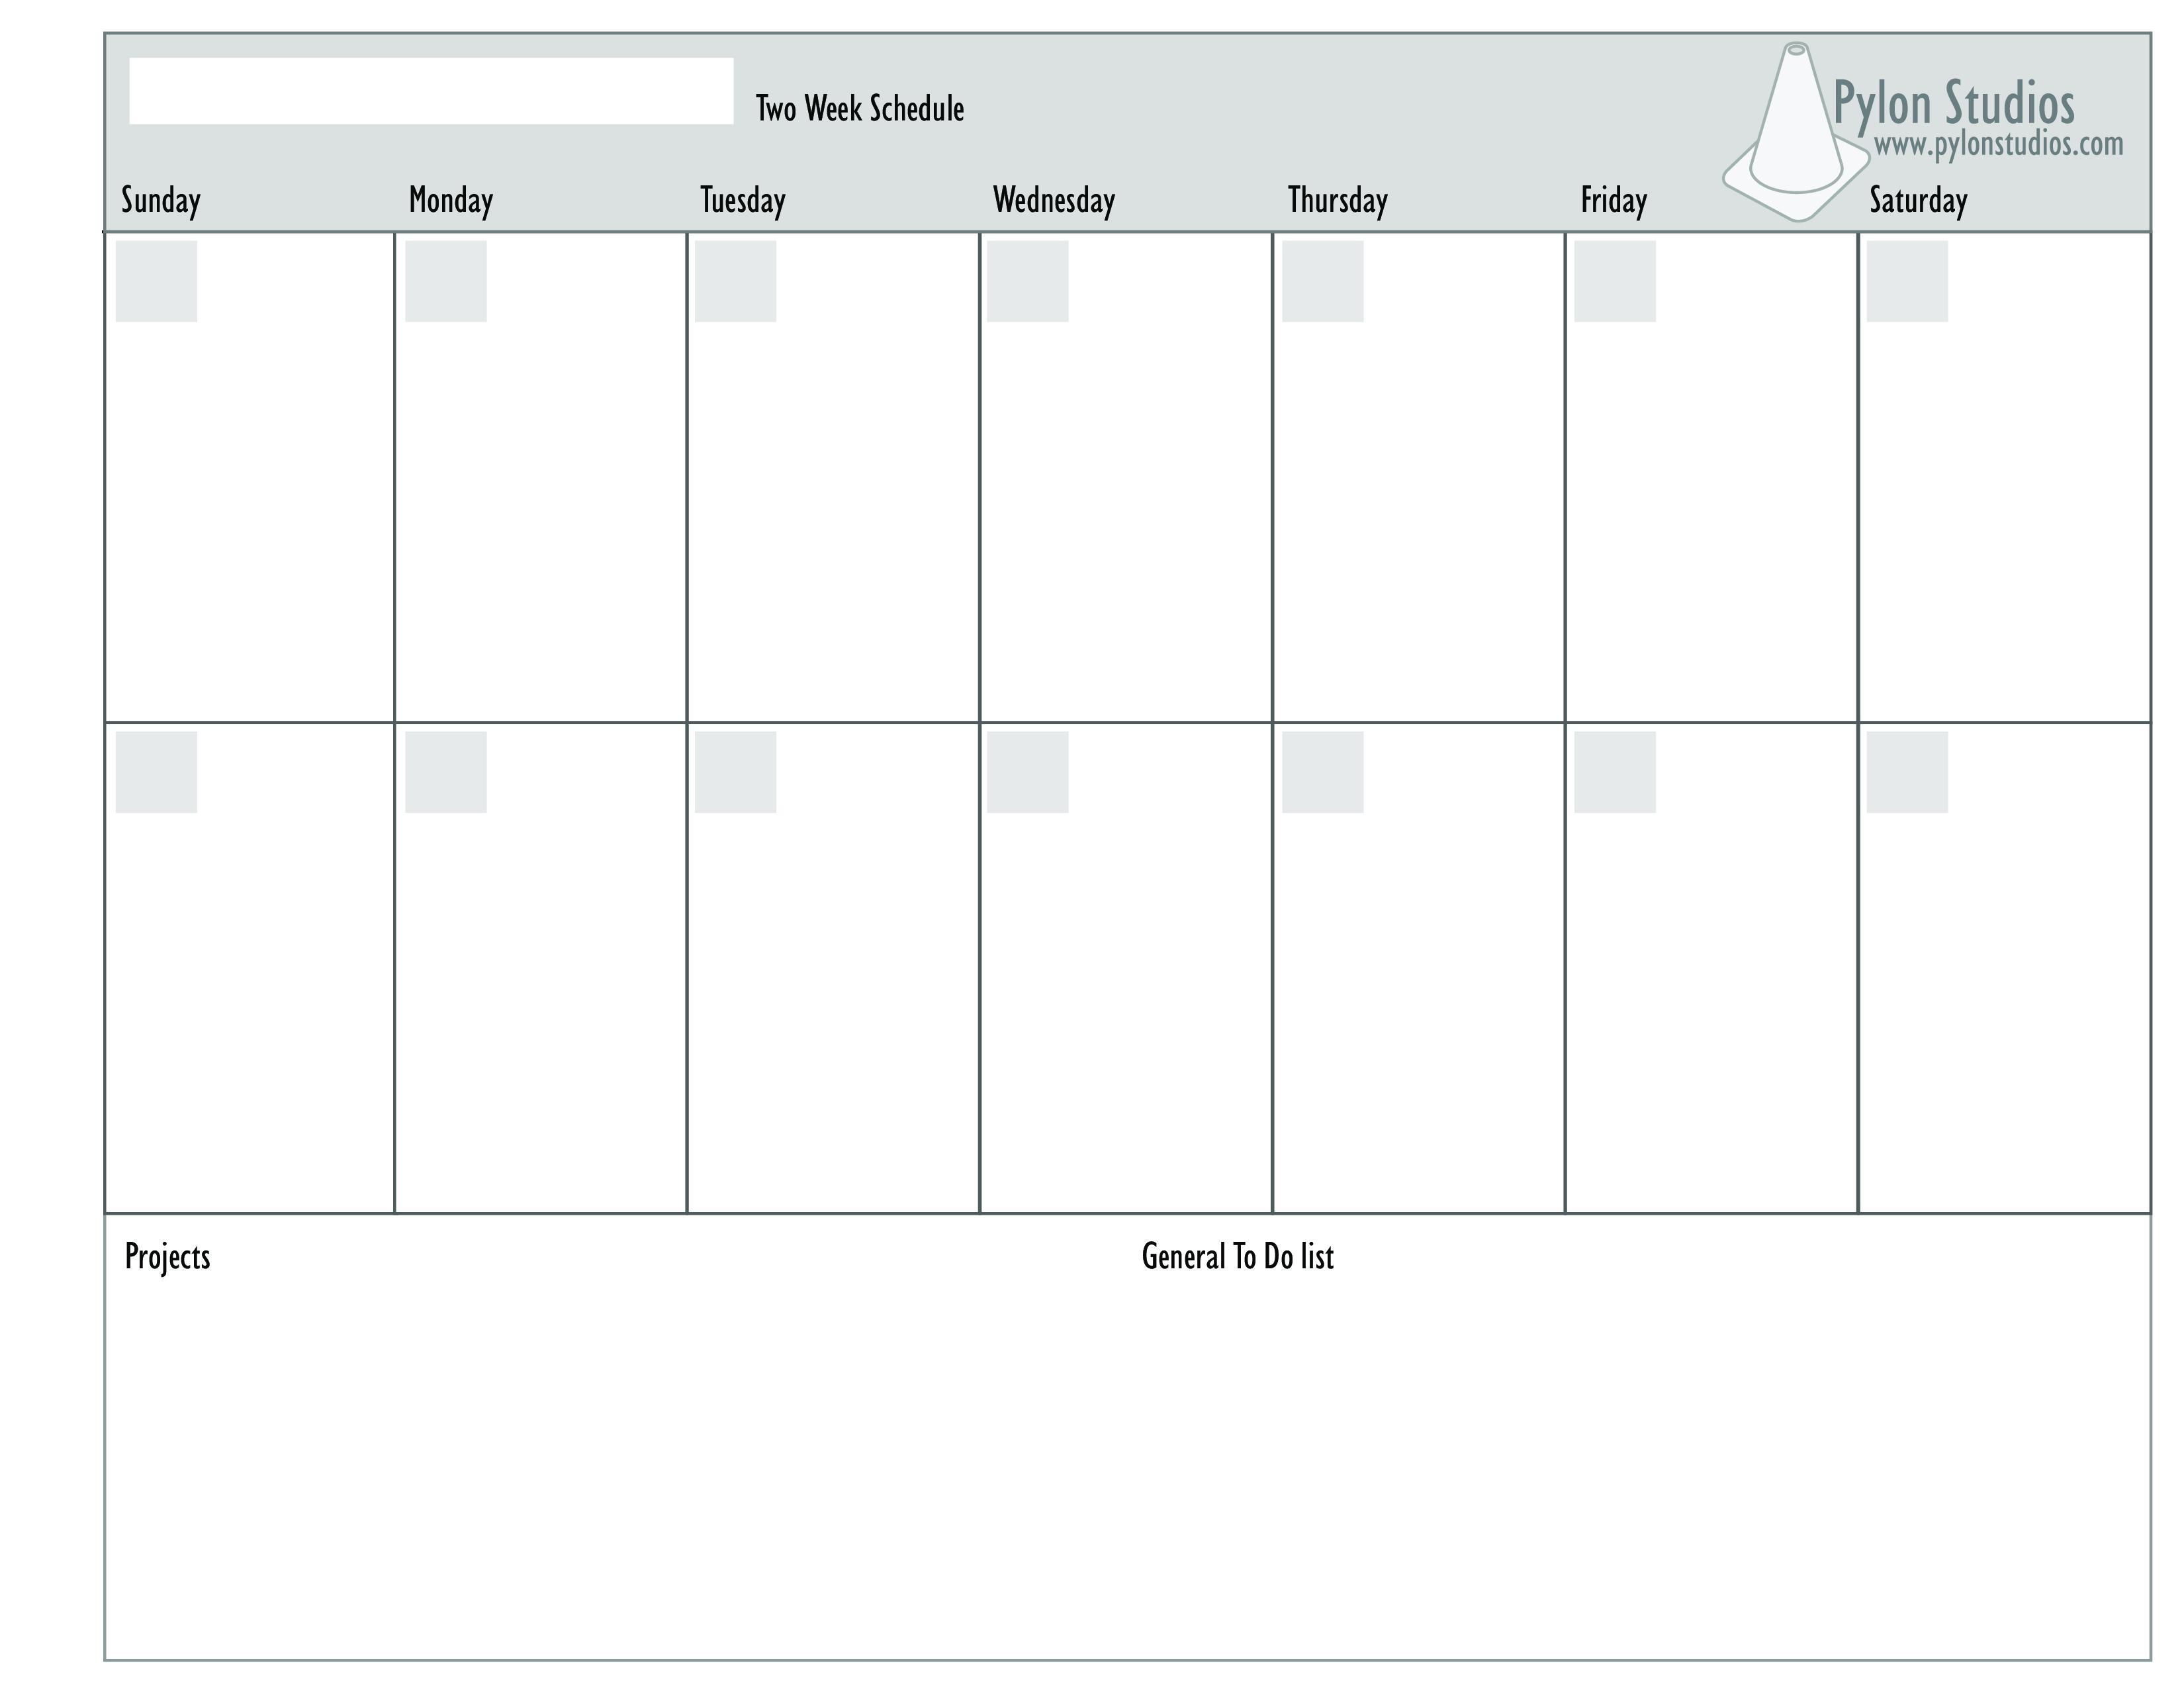 001 20Week Calendar Template Free Templates At Allbusinesstemplates for 2 Week Schedule Template Mon- Sunday